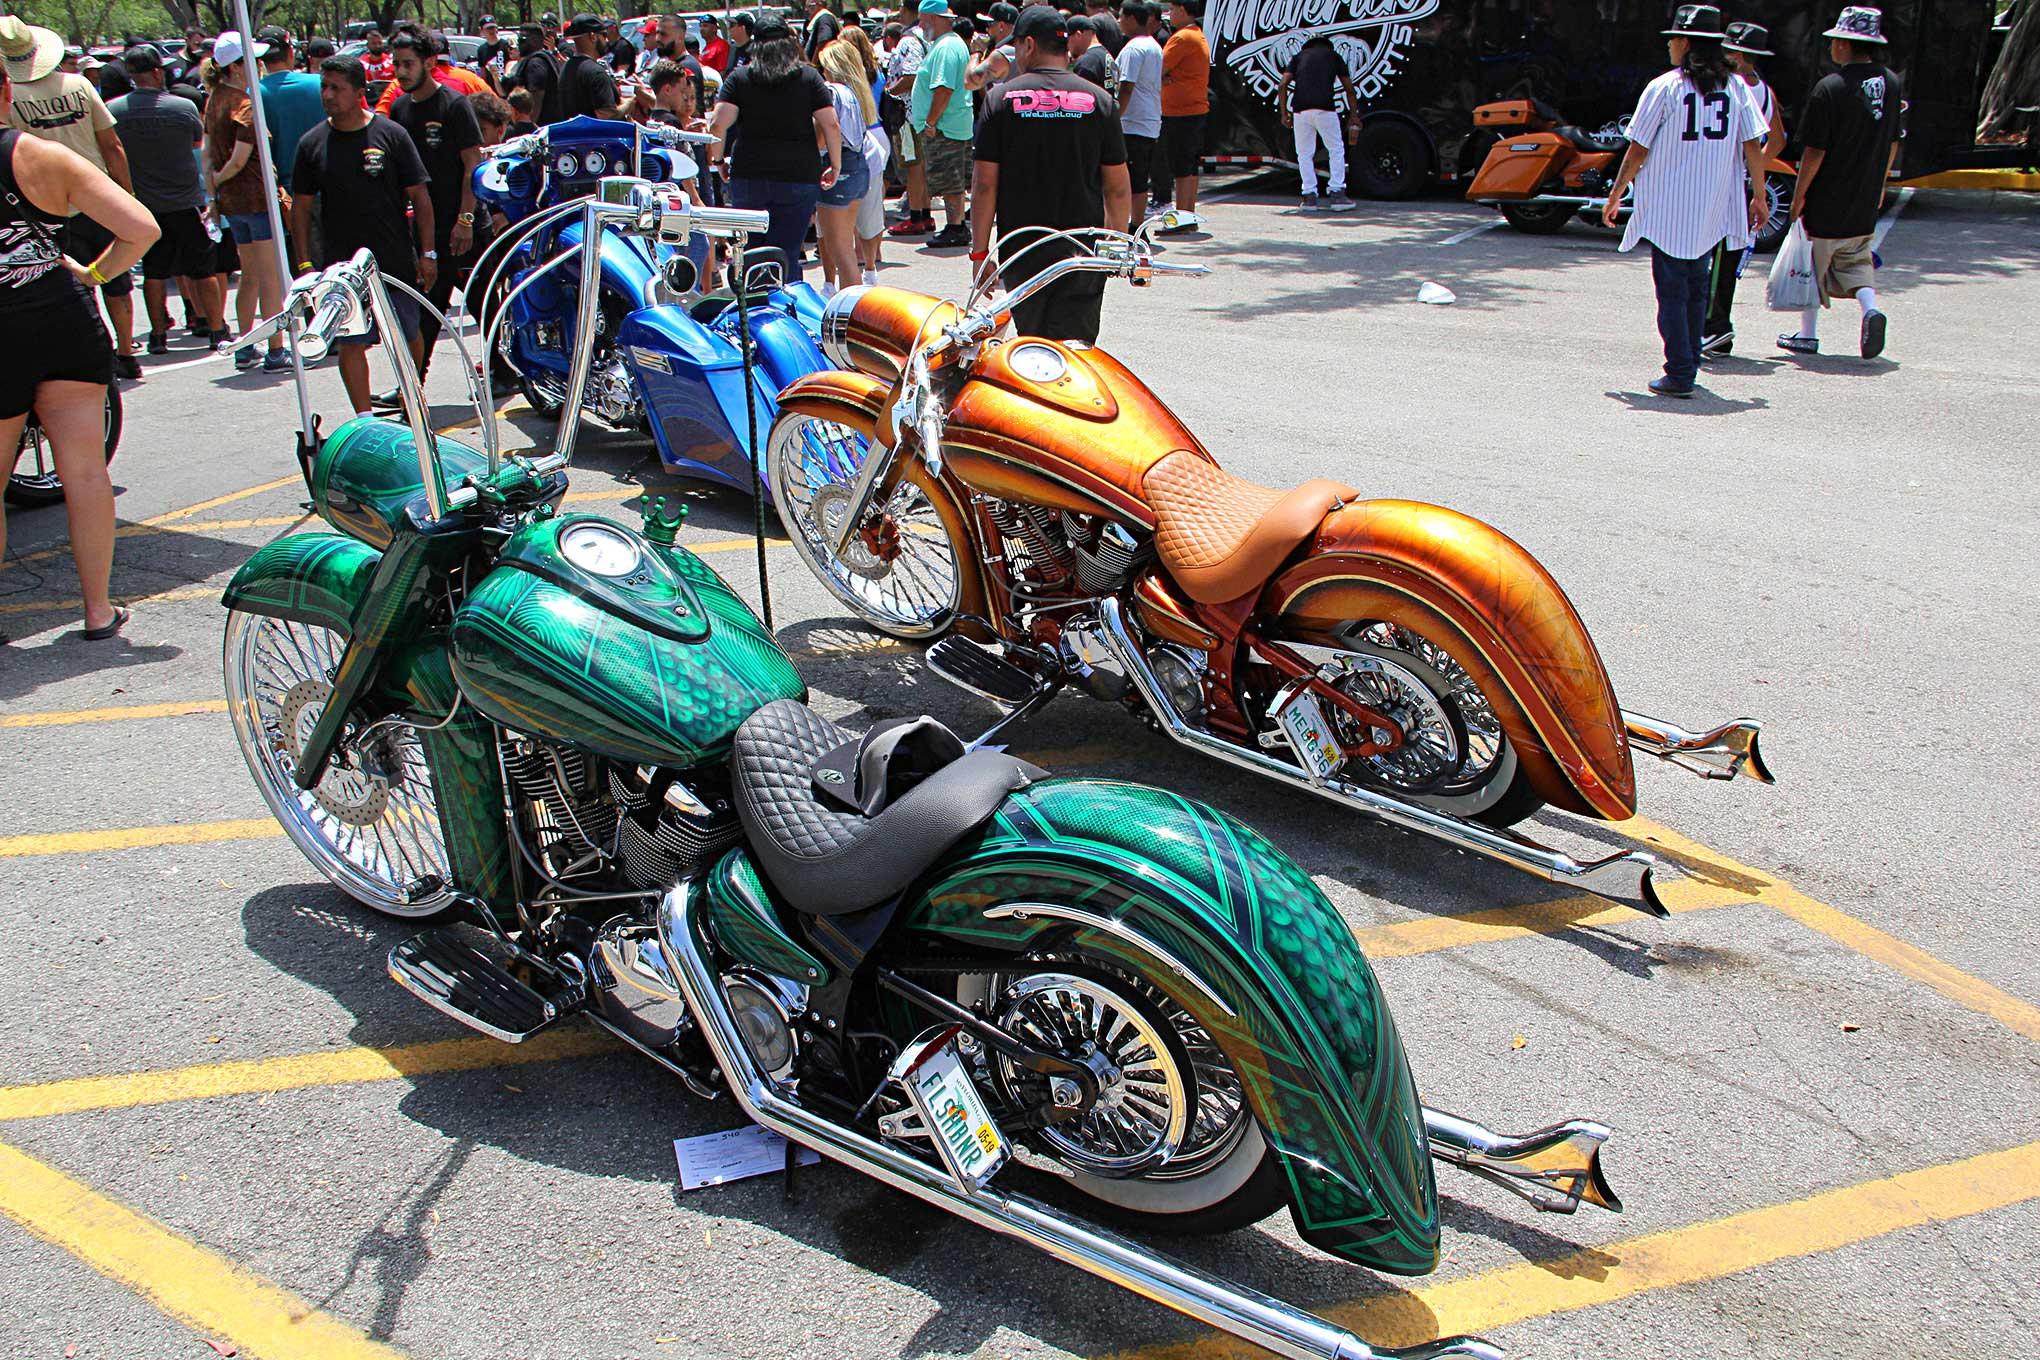 2019 Lowrider Miami Super Show Custom Motorcycles Lowrider